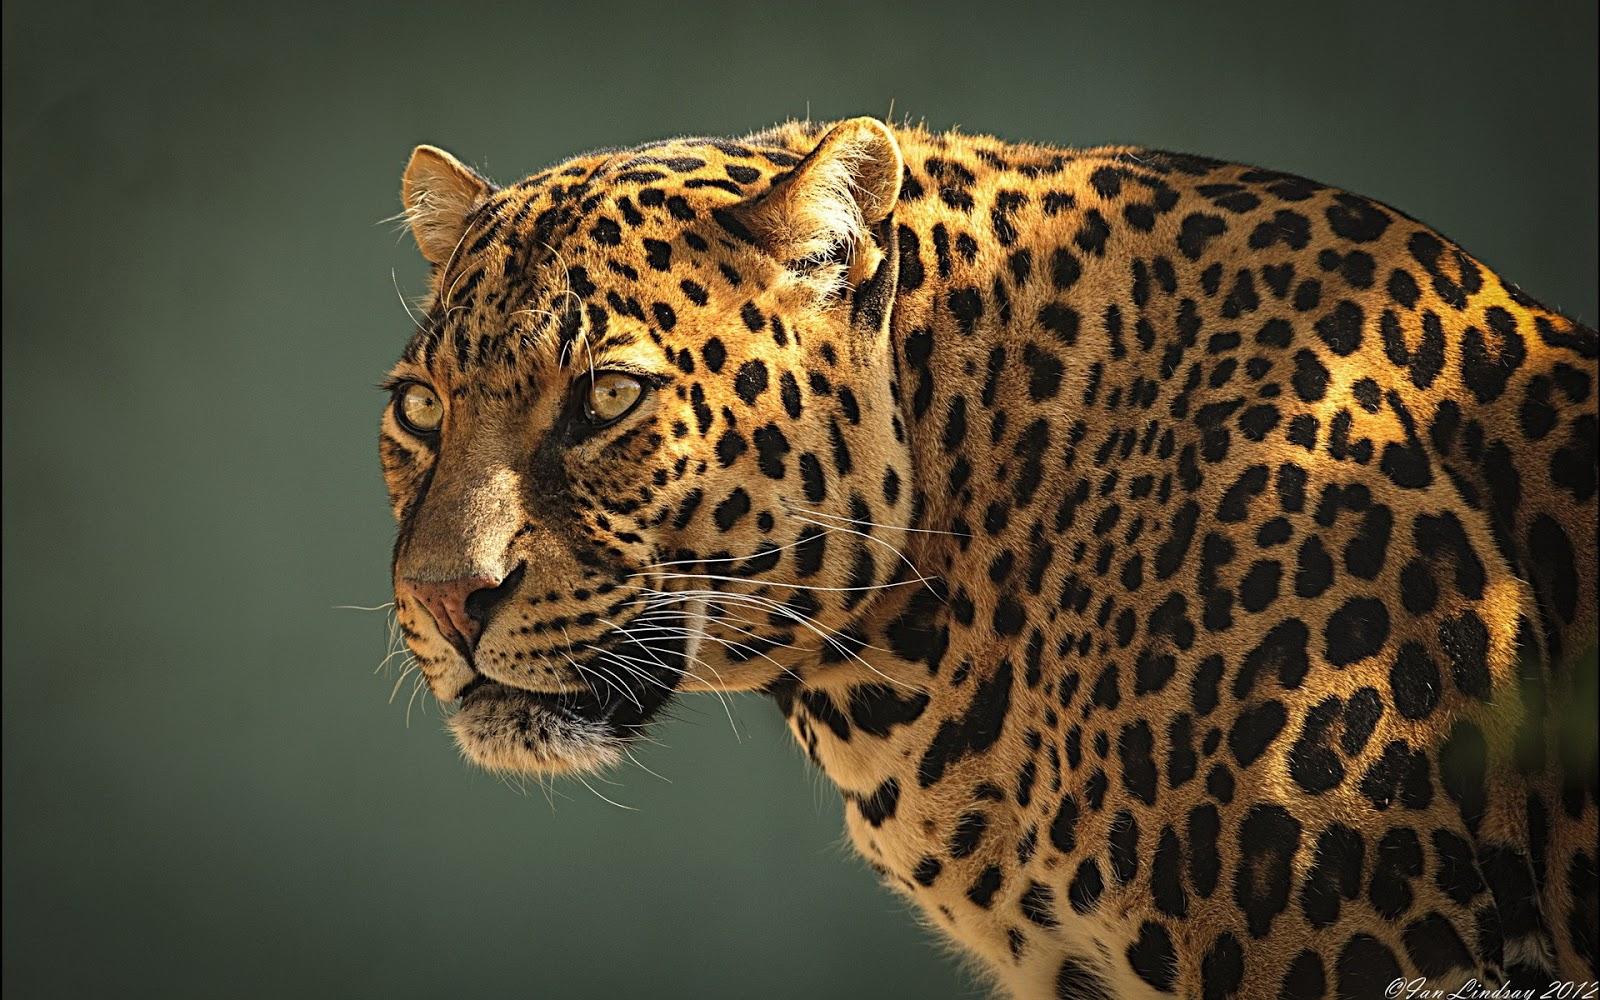 Fondo De Pantalla De Leopardo Fondos De Pantalla Gratis: Fondos De Pantalla HD